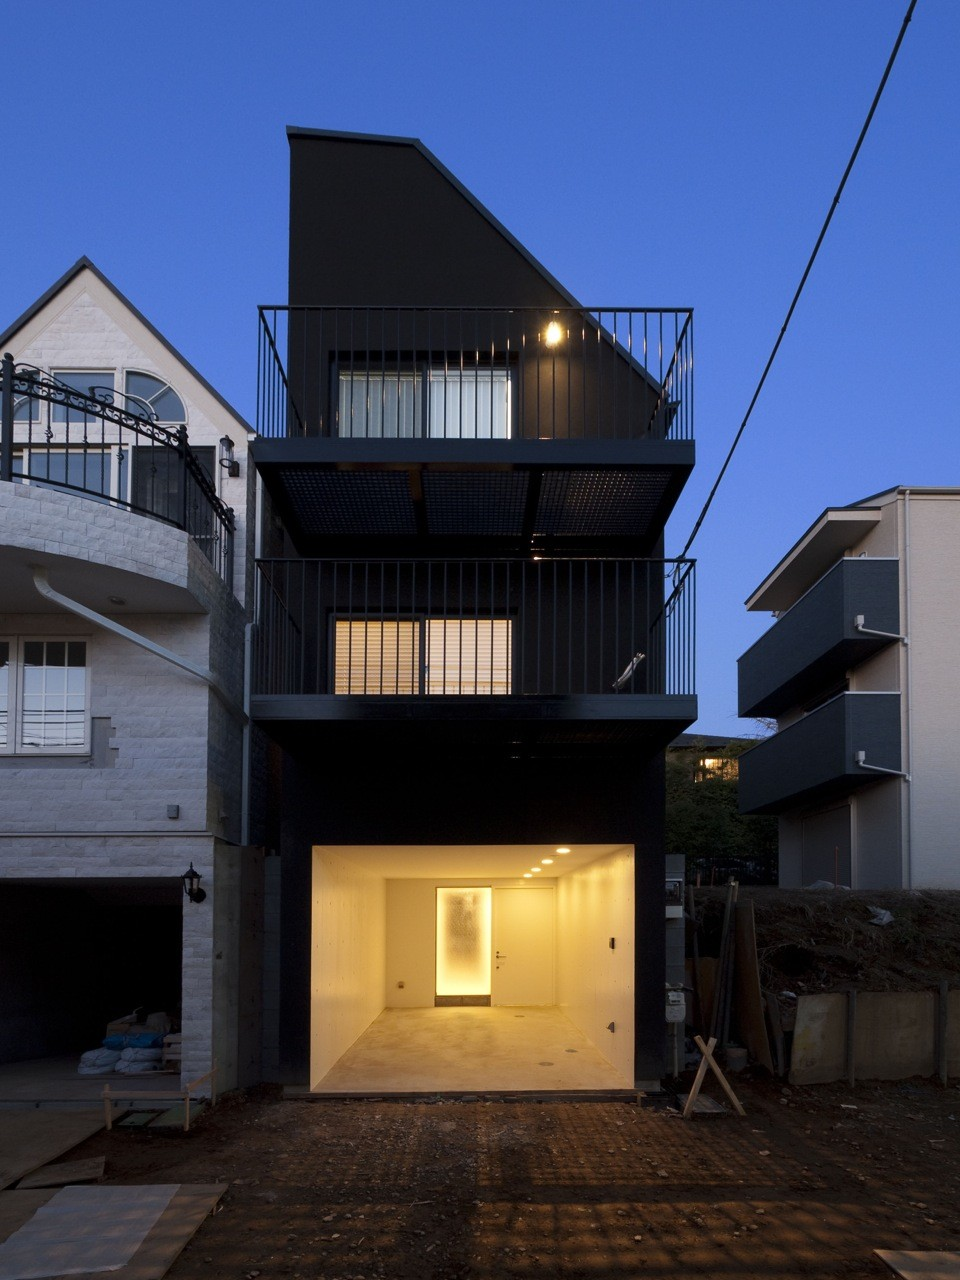 House Contrast / Key Operation, © Tokyo gumi, KOP